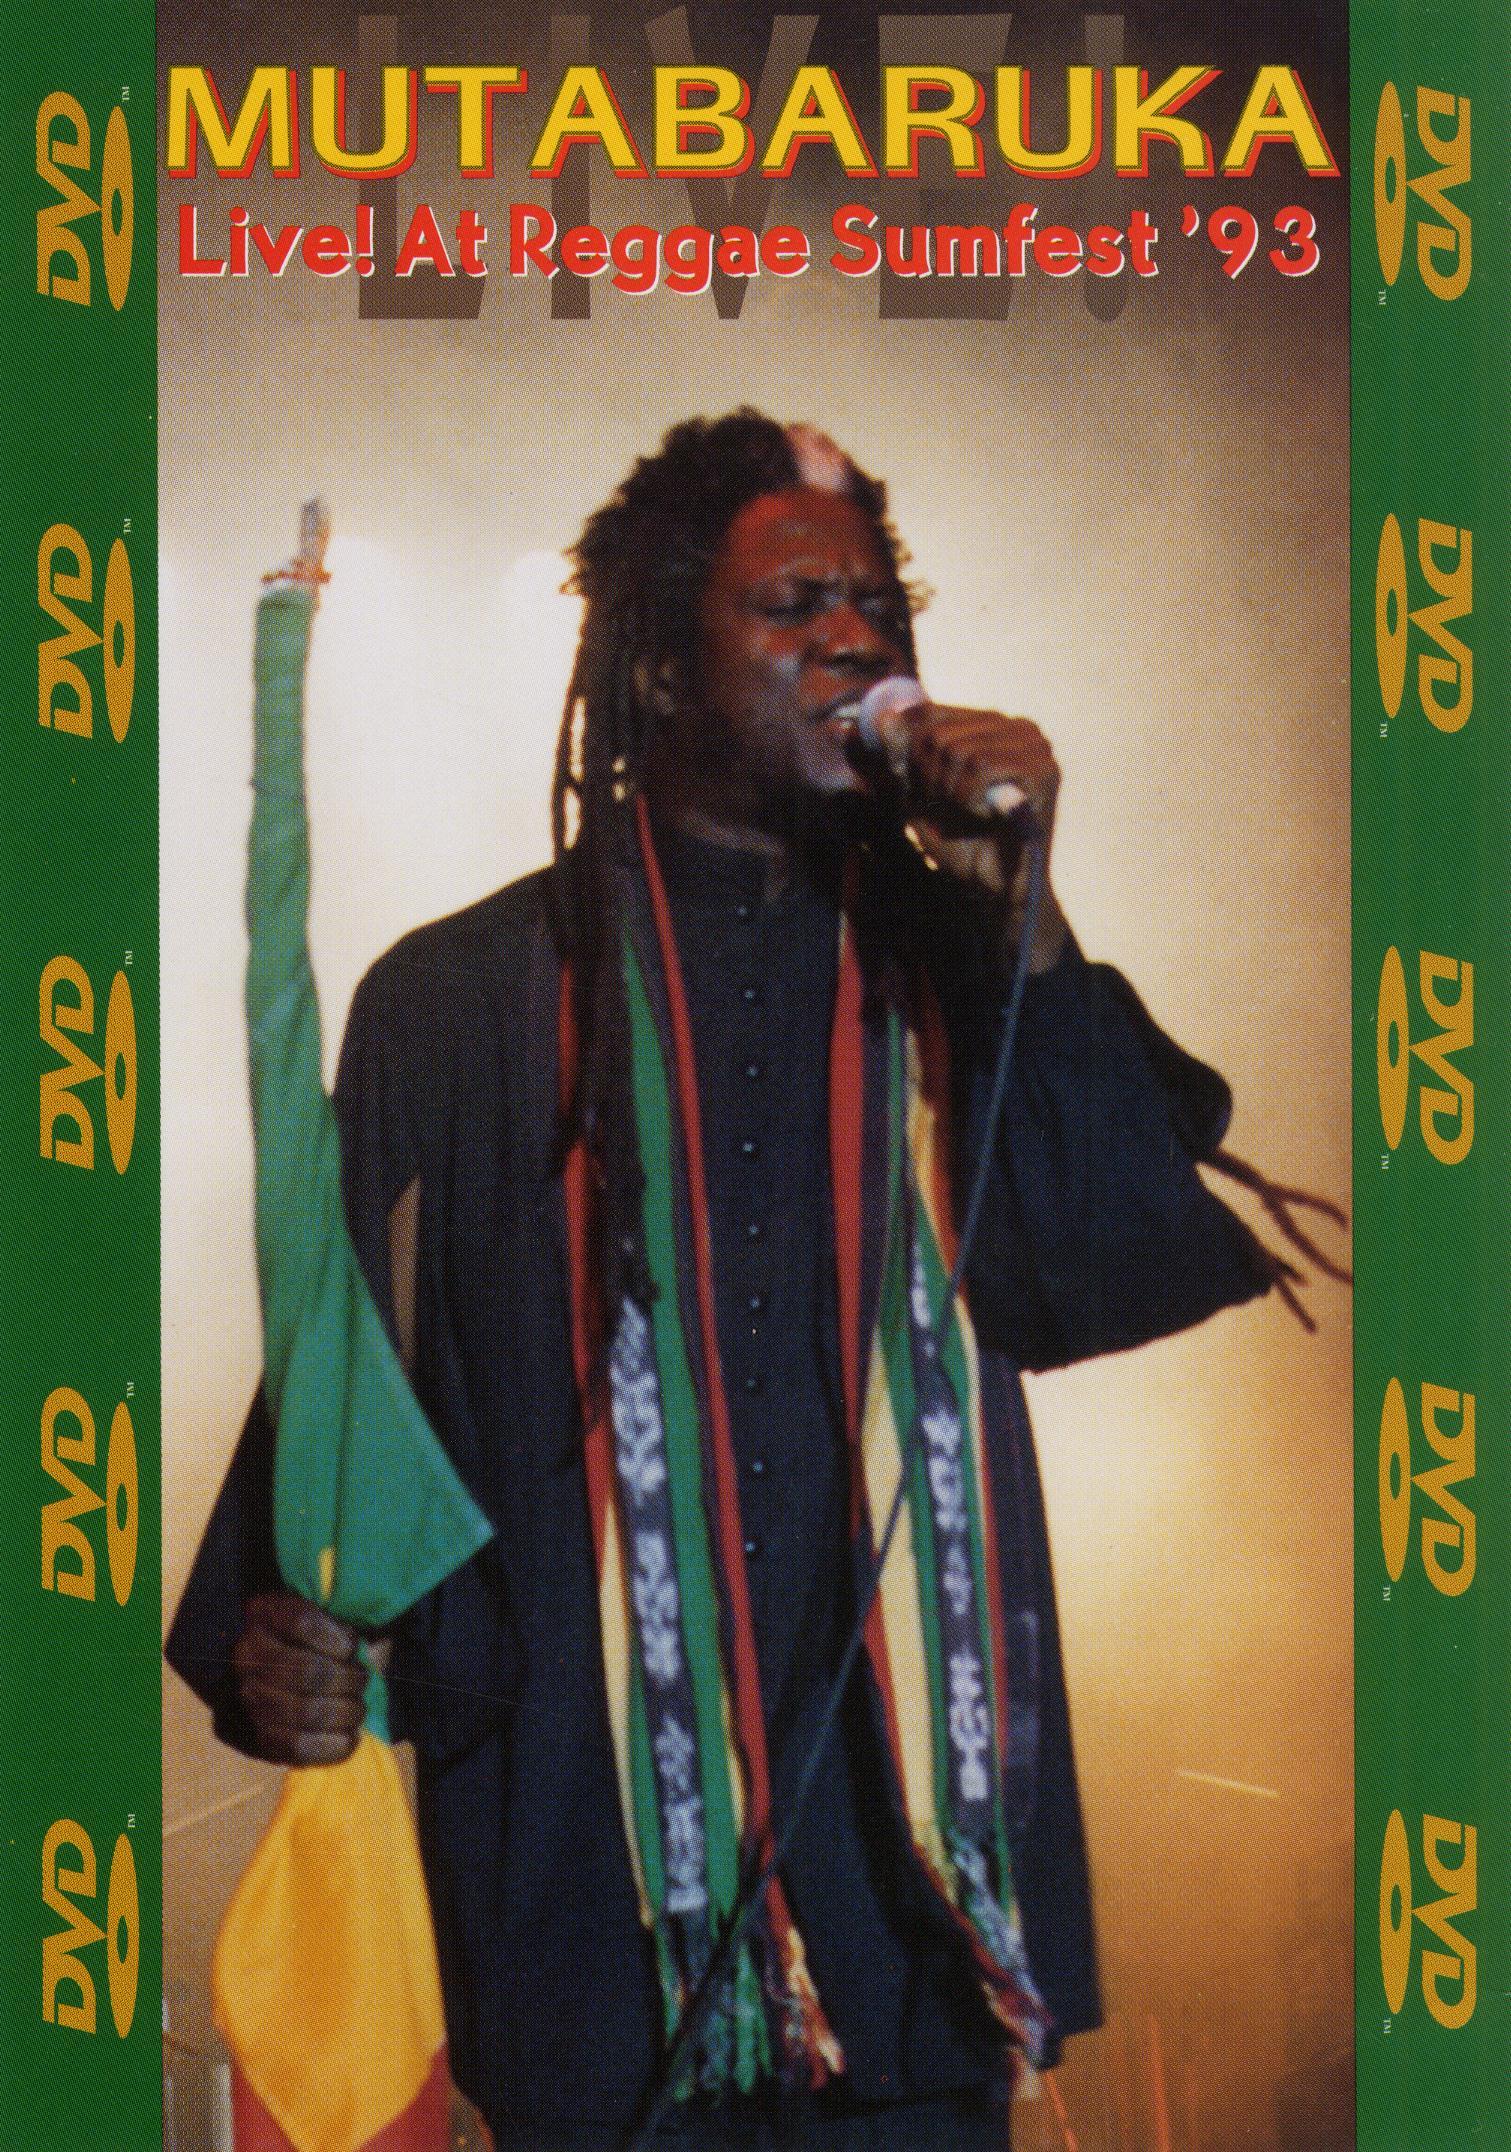 Mutabaruka: Live! At Reggae Sumfest '93